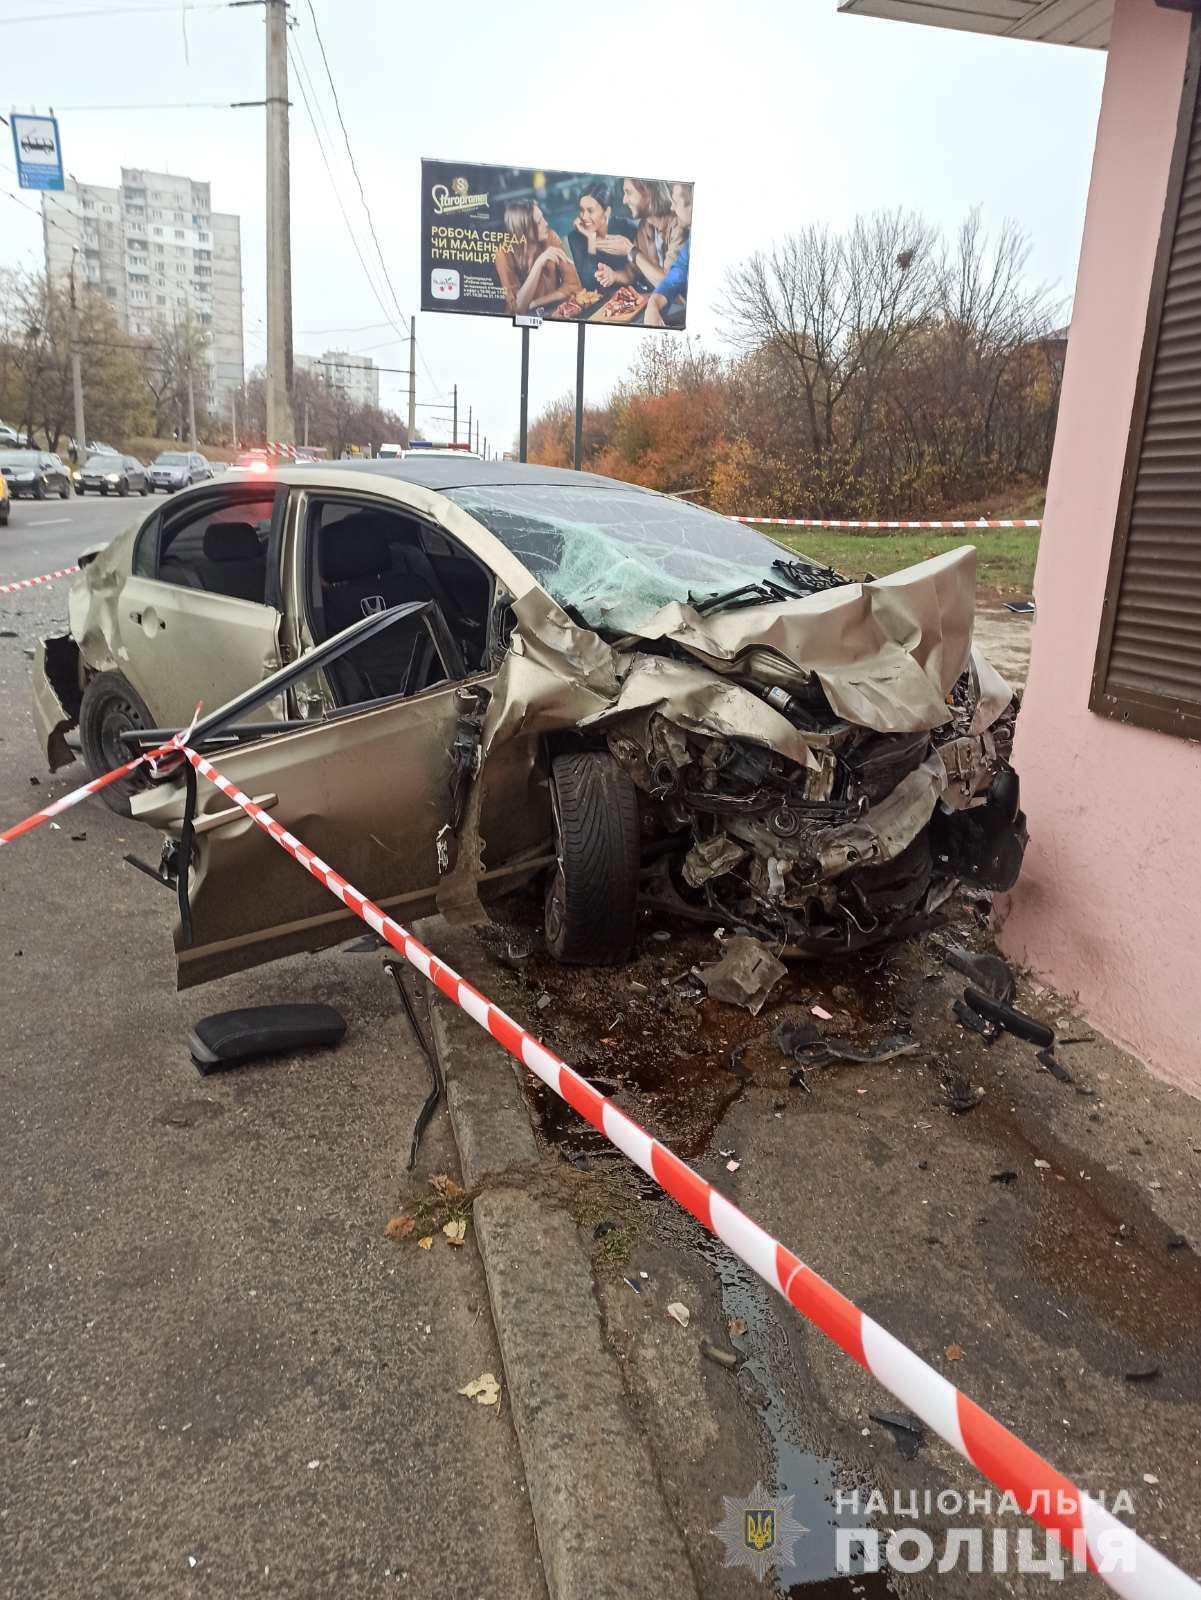 Honda Civic отбросило в остановку